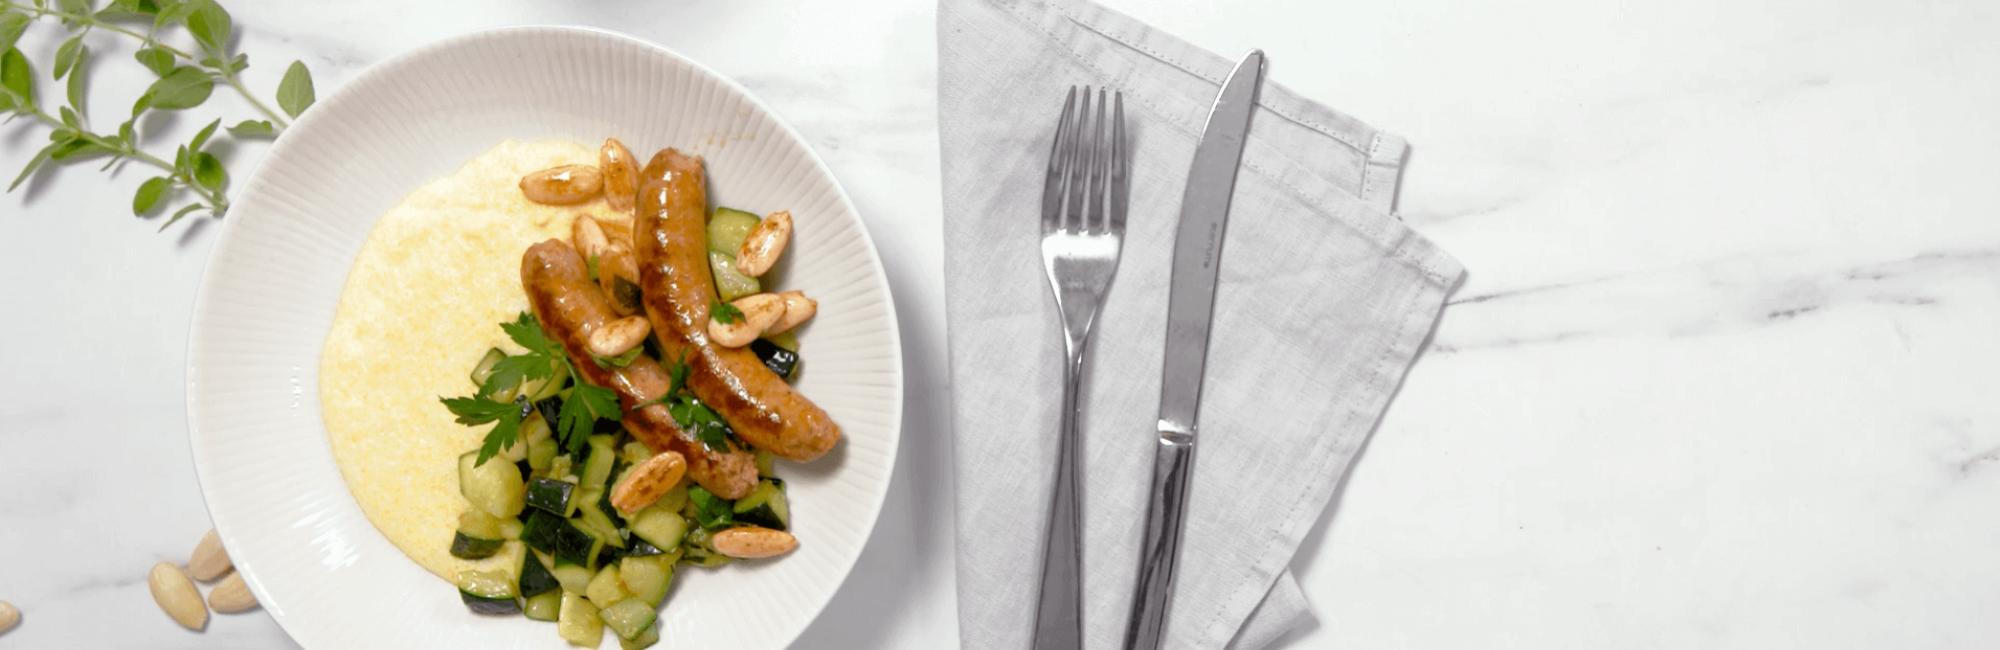 Merguez, amandelen, courgette, polenta